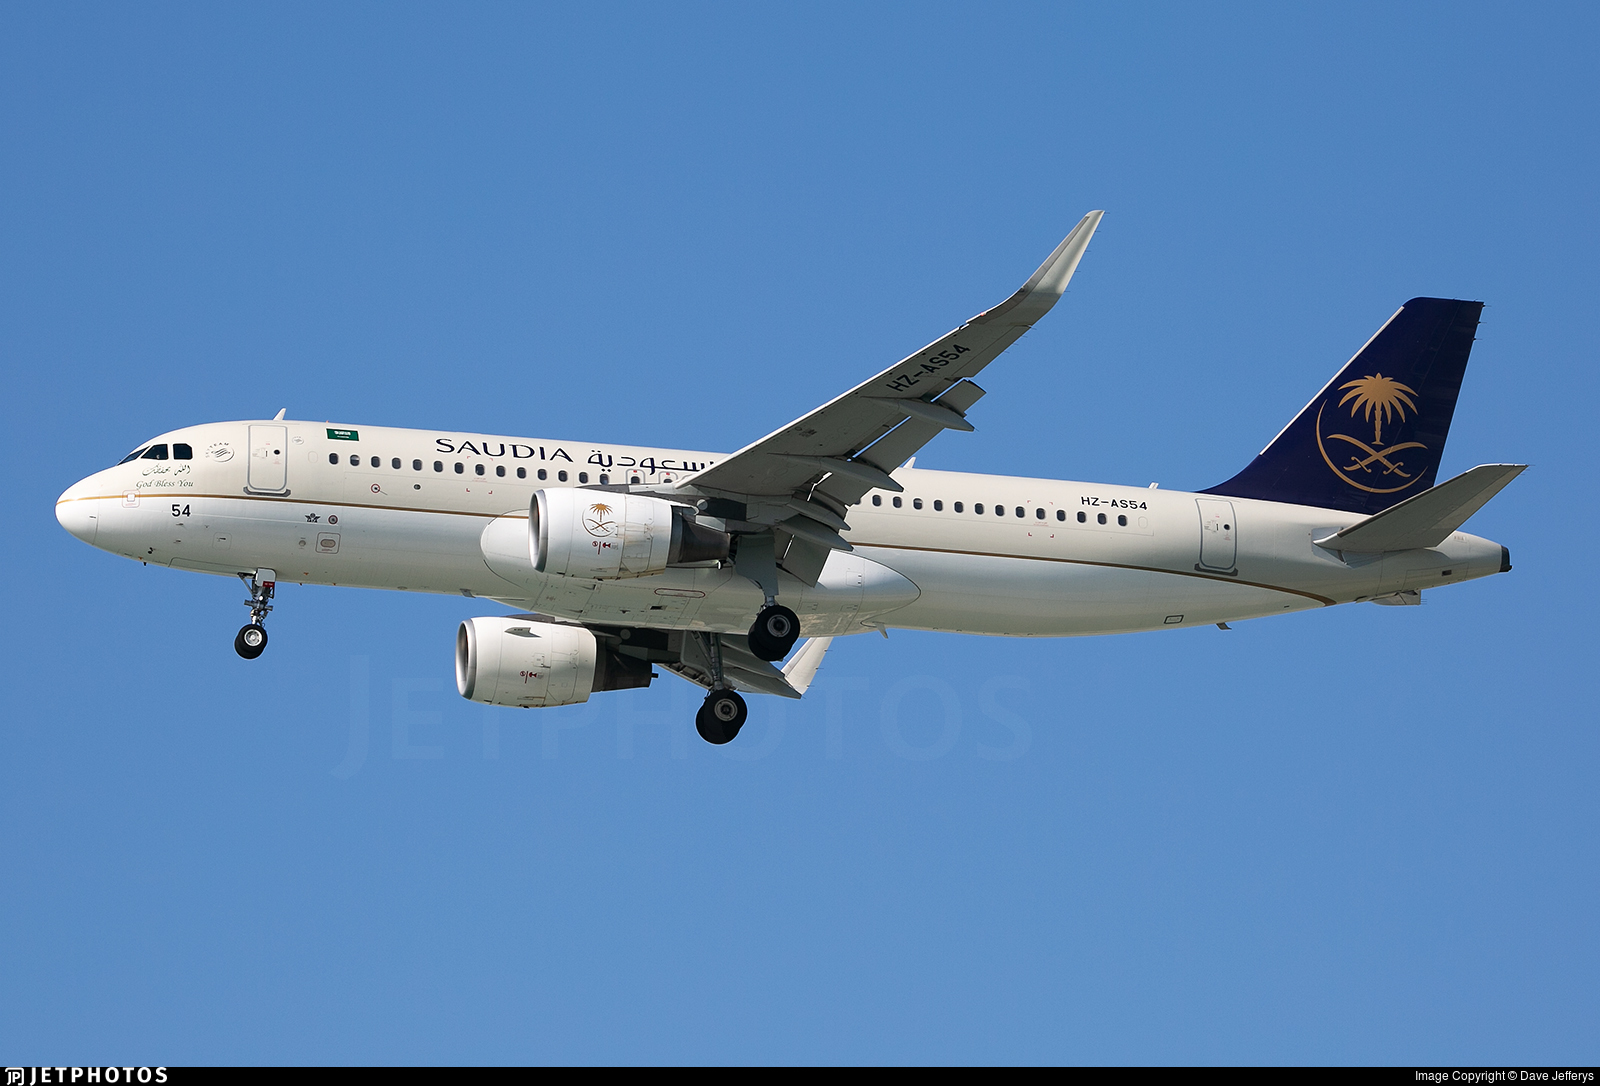 HZ-AS54 - Airbus A320-214 - Saudi Arabian Airlines